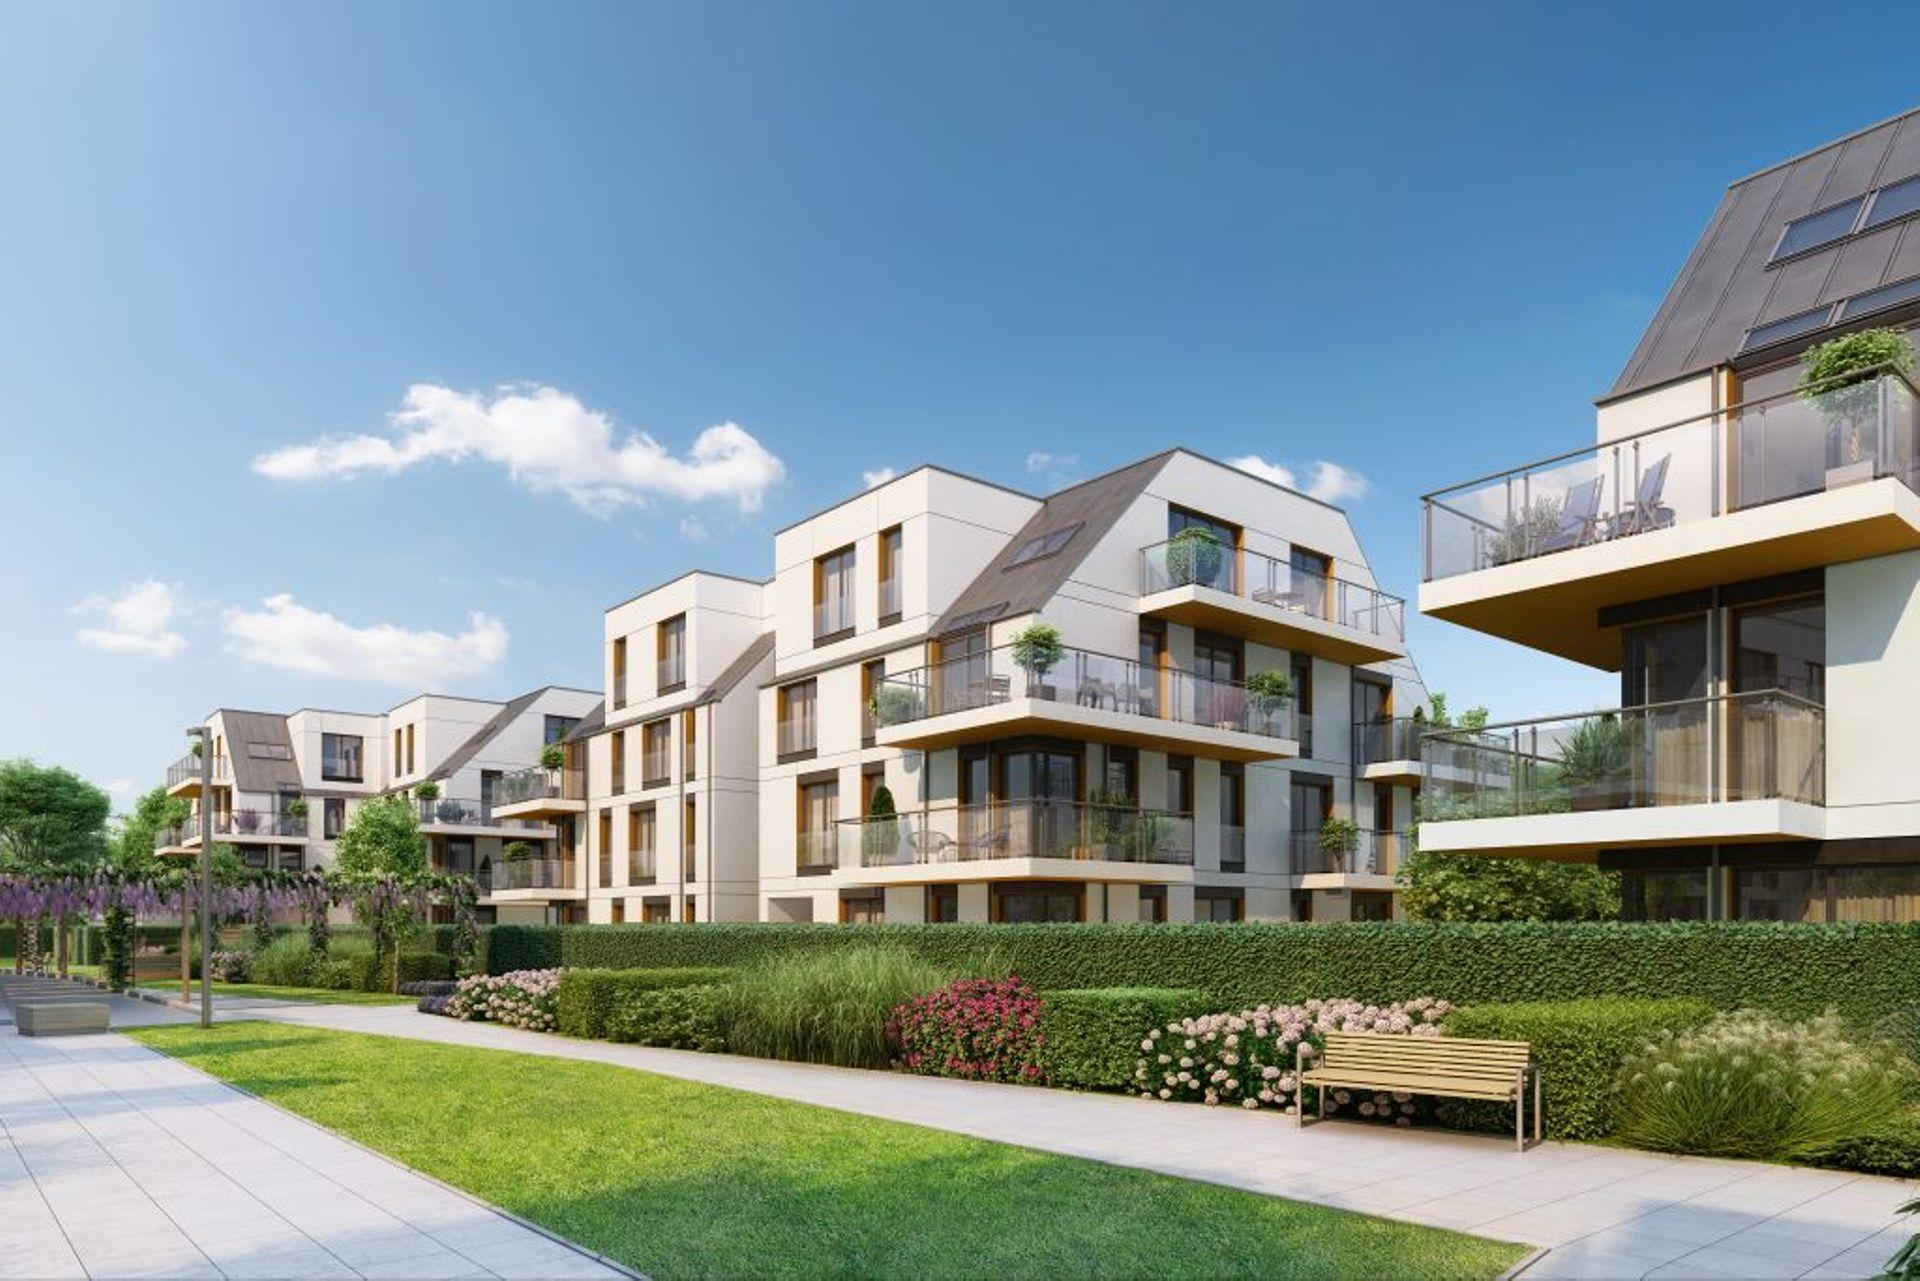 Wrocław: Lokum Villa Nova – Lokum Deweloper buduje niemal 100 mieszkań na Kowalach